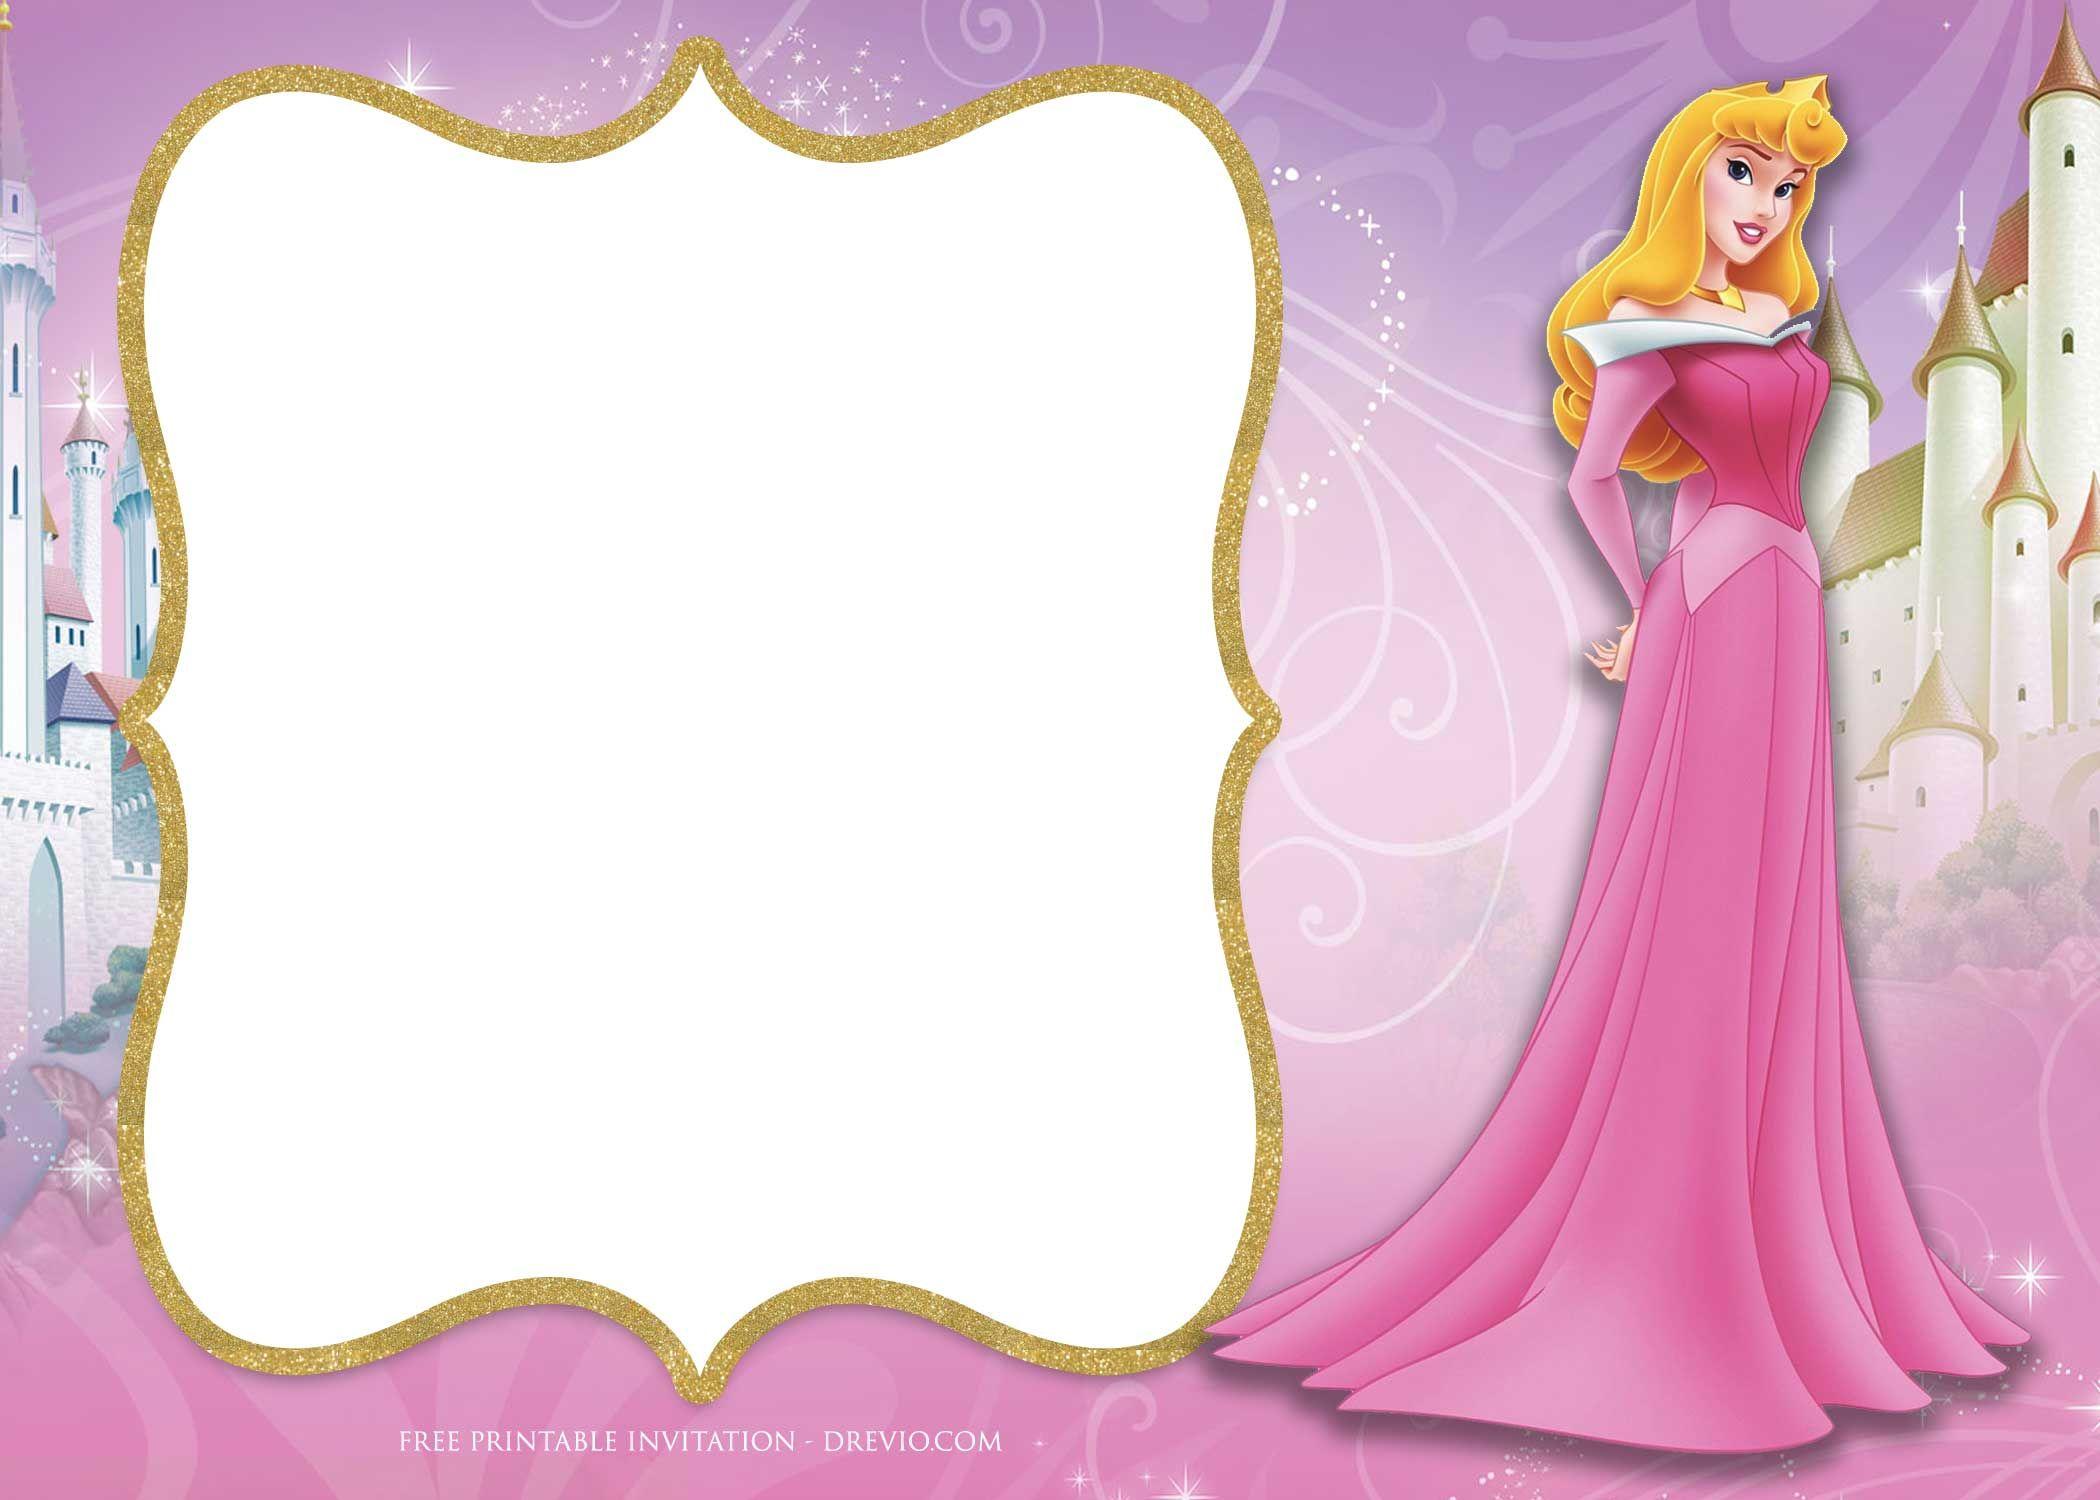 Cool FREE Printable Princess Aurora Sleeping Beauty Invitation Templates